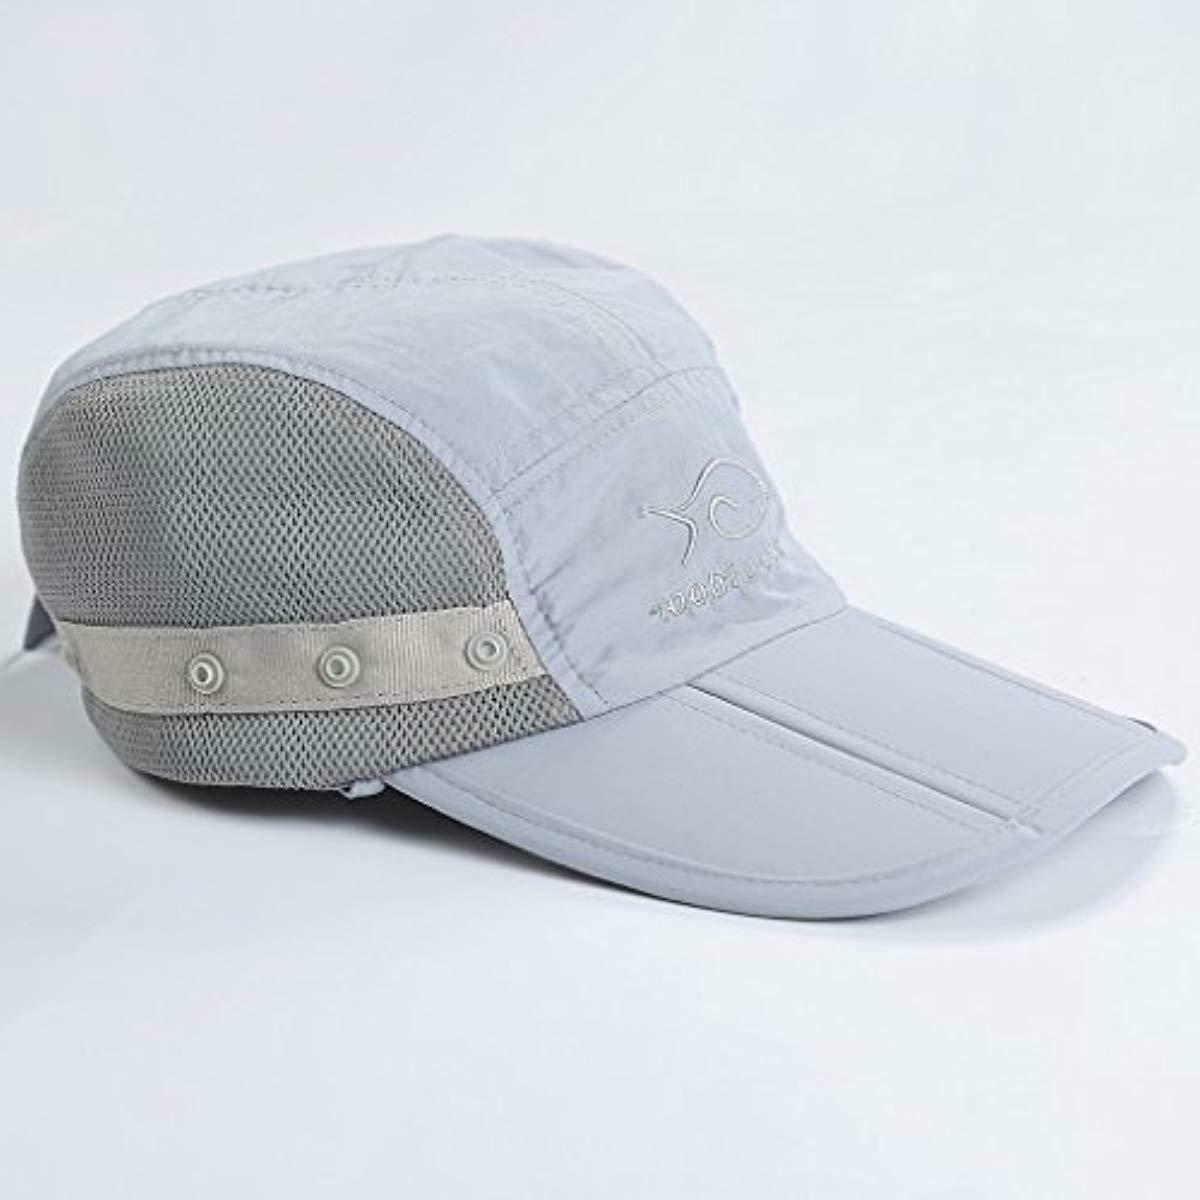 DDYOUTDOOR Fishing Neck Flap Hat